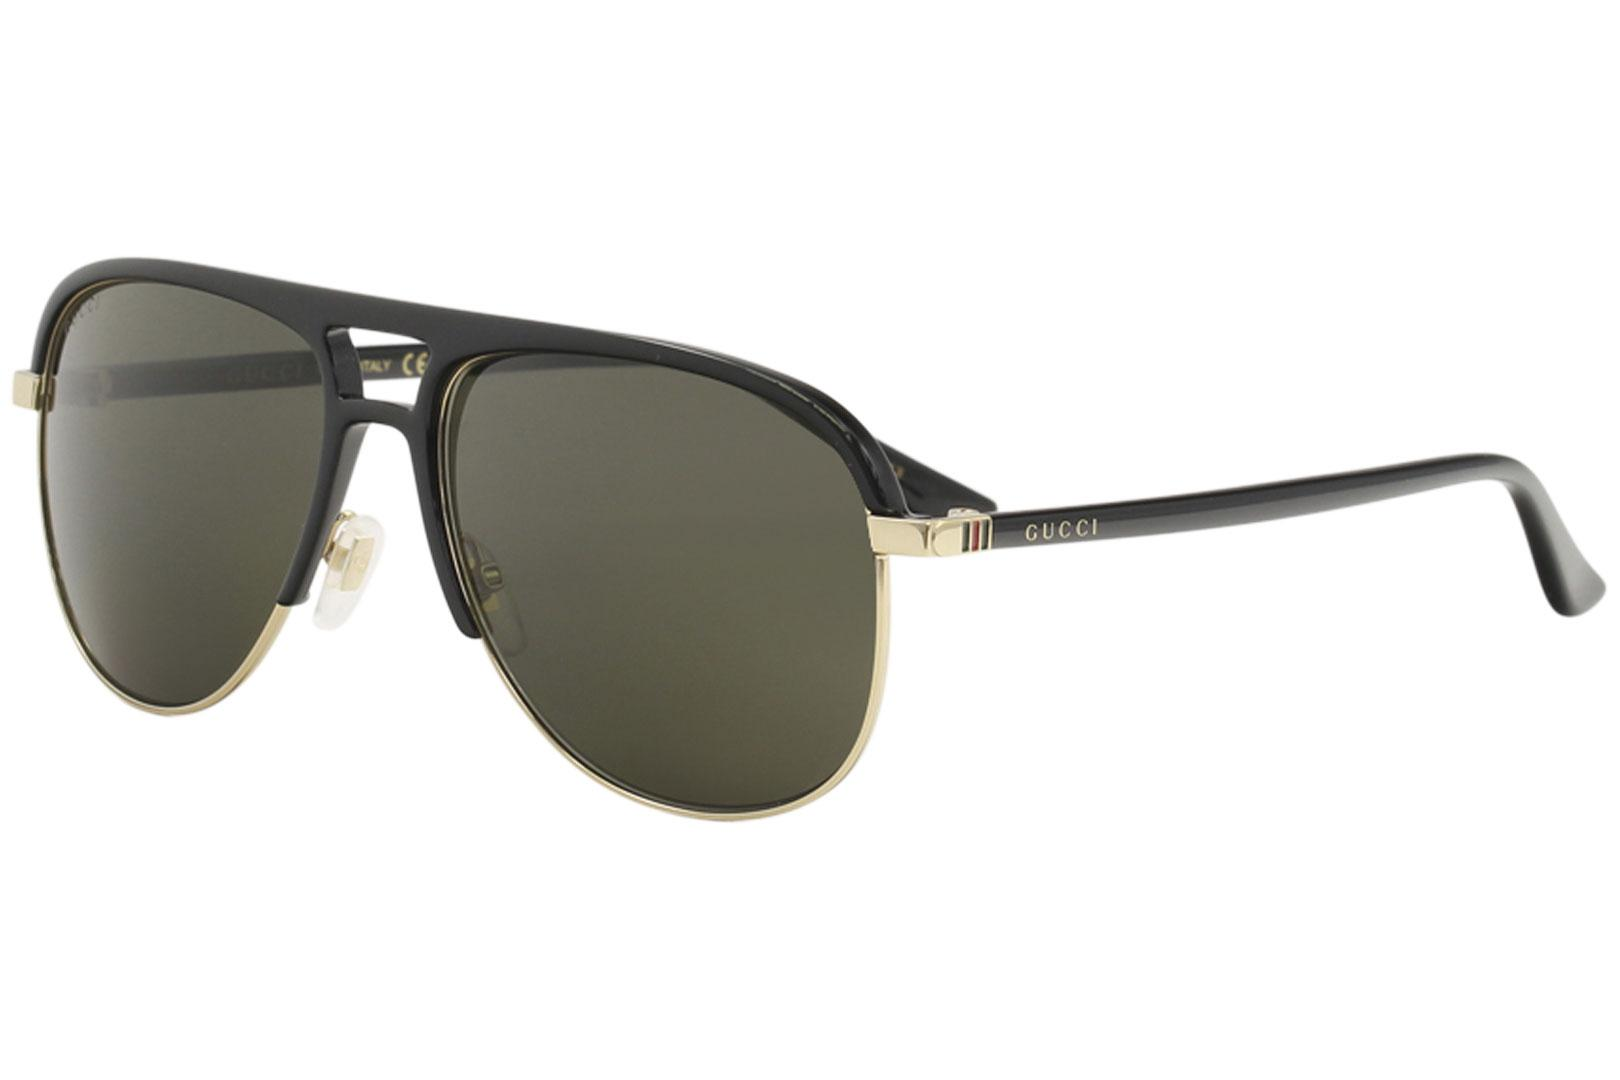 4e3701424b Gucci Women s GG0292S GG 0292 S Fashion Pilot Sunglasses